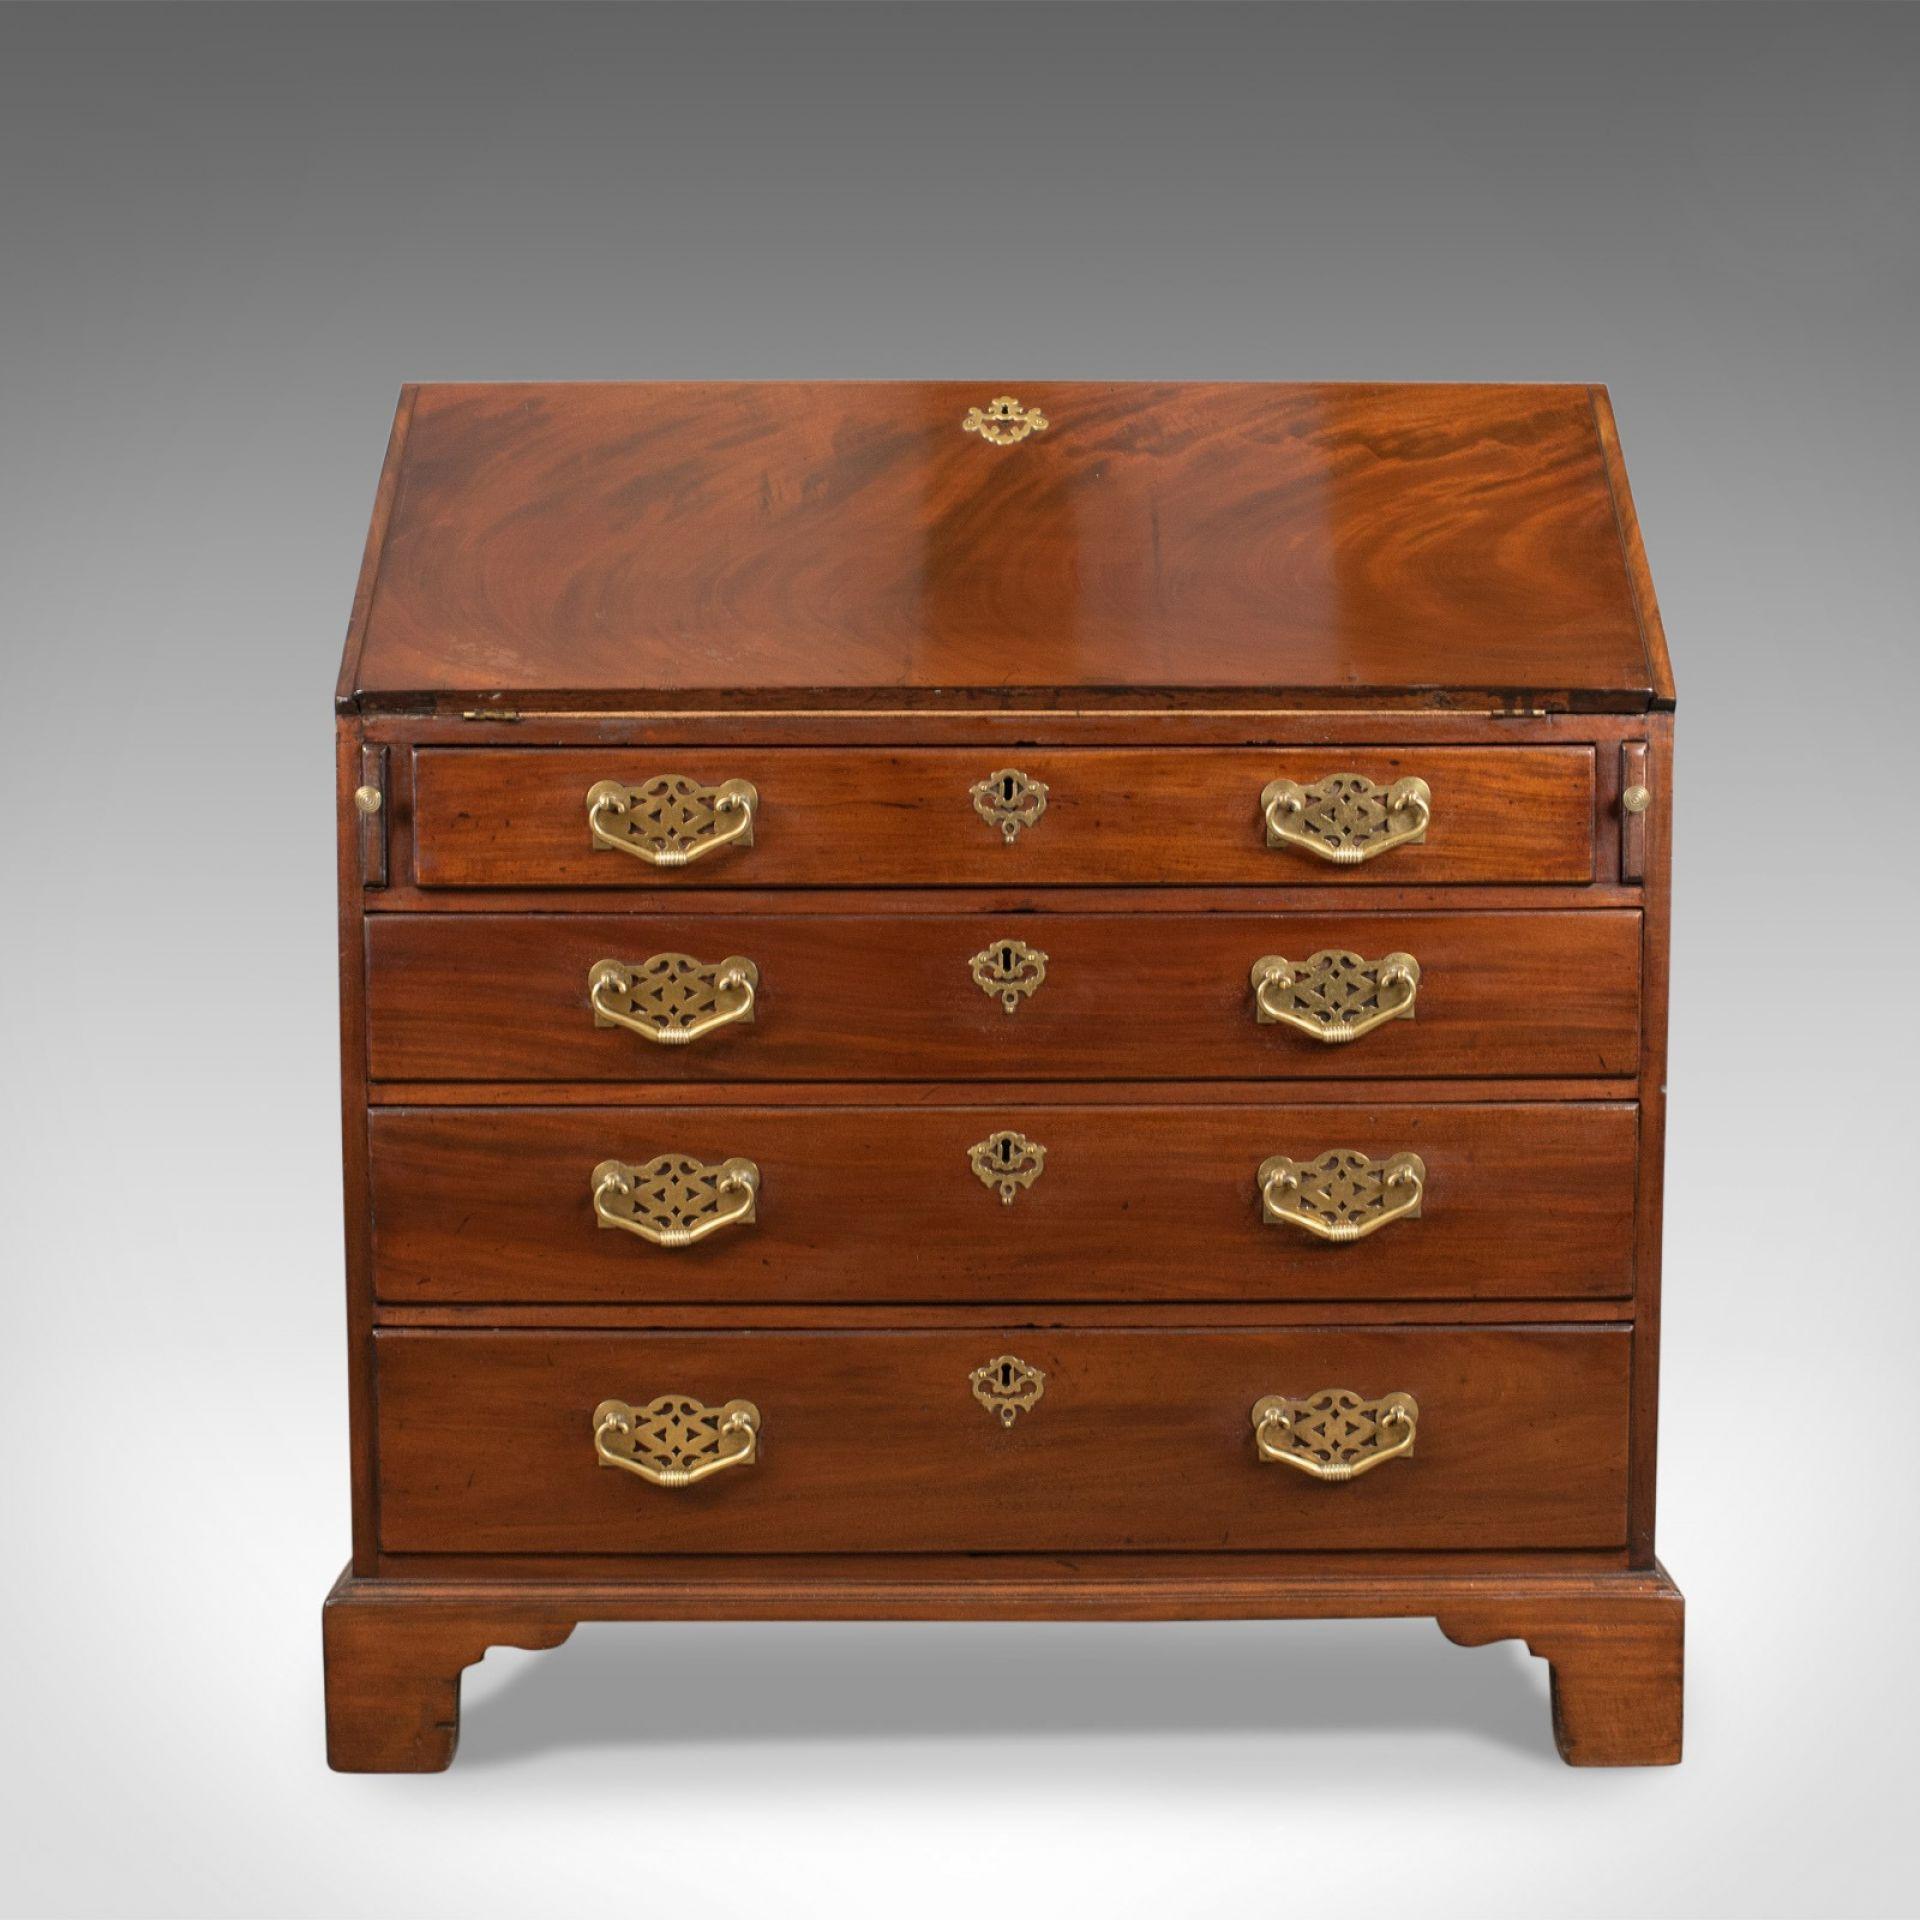 Antique Bureau, Mahogany, English, Georgian, Generous Desk Space, Circa 1800